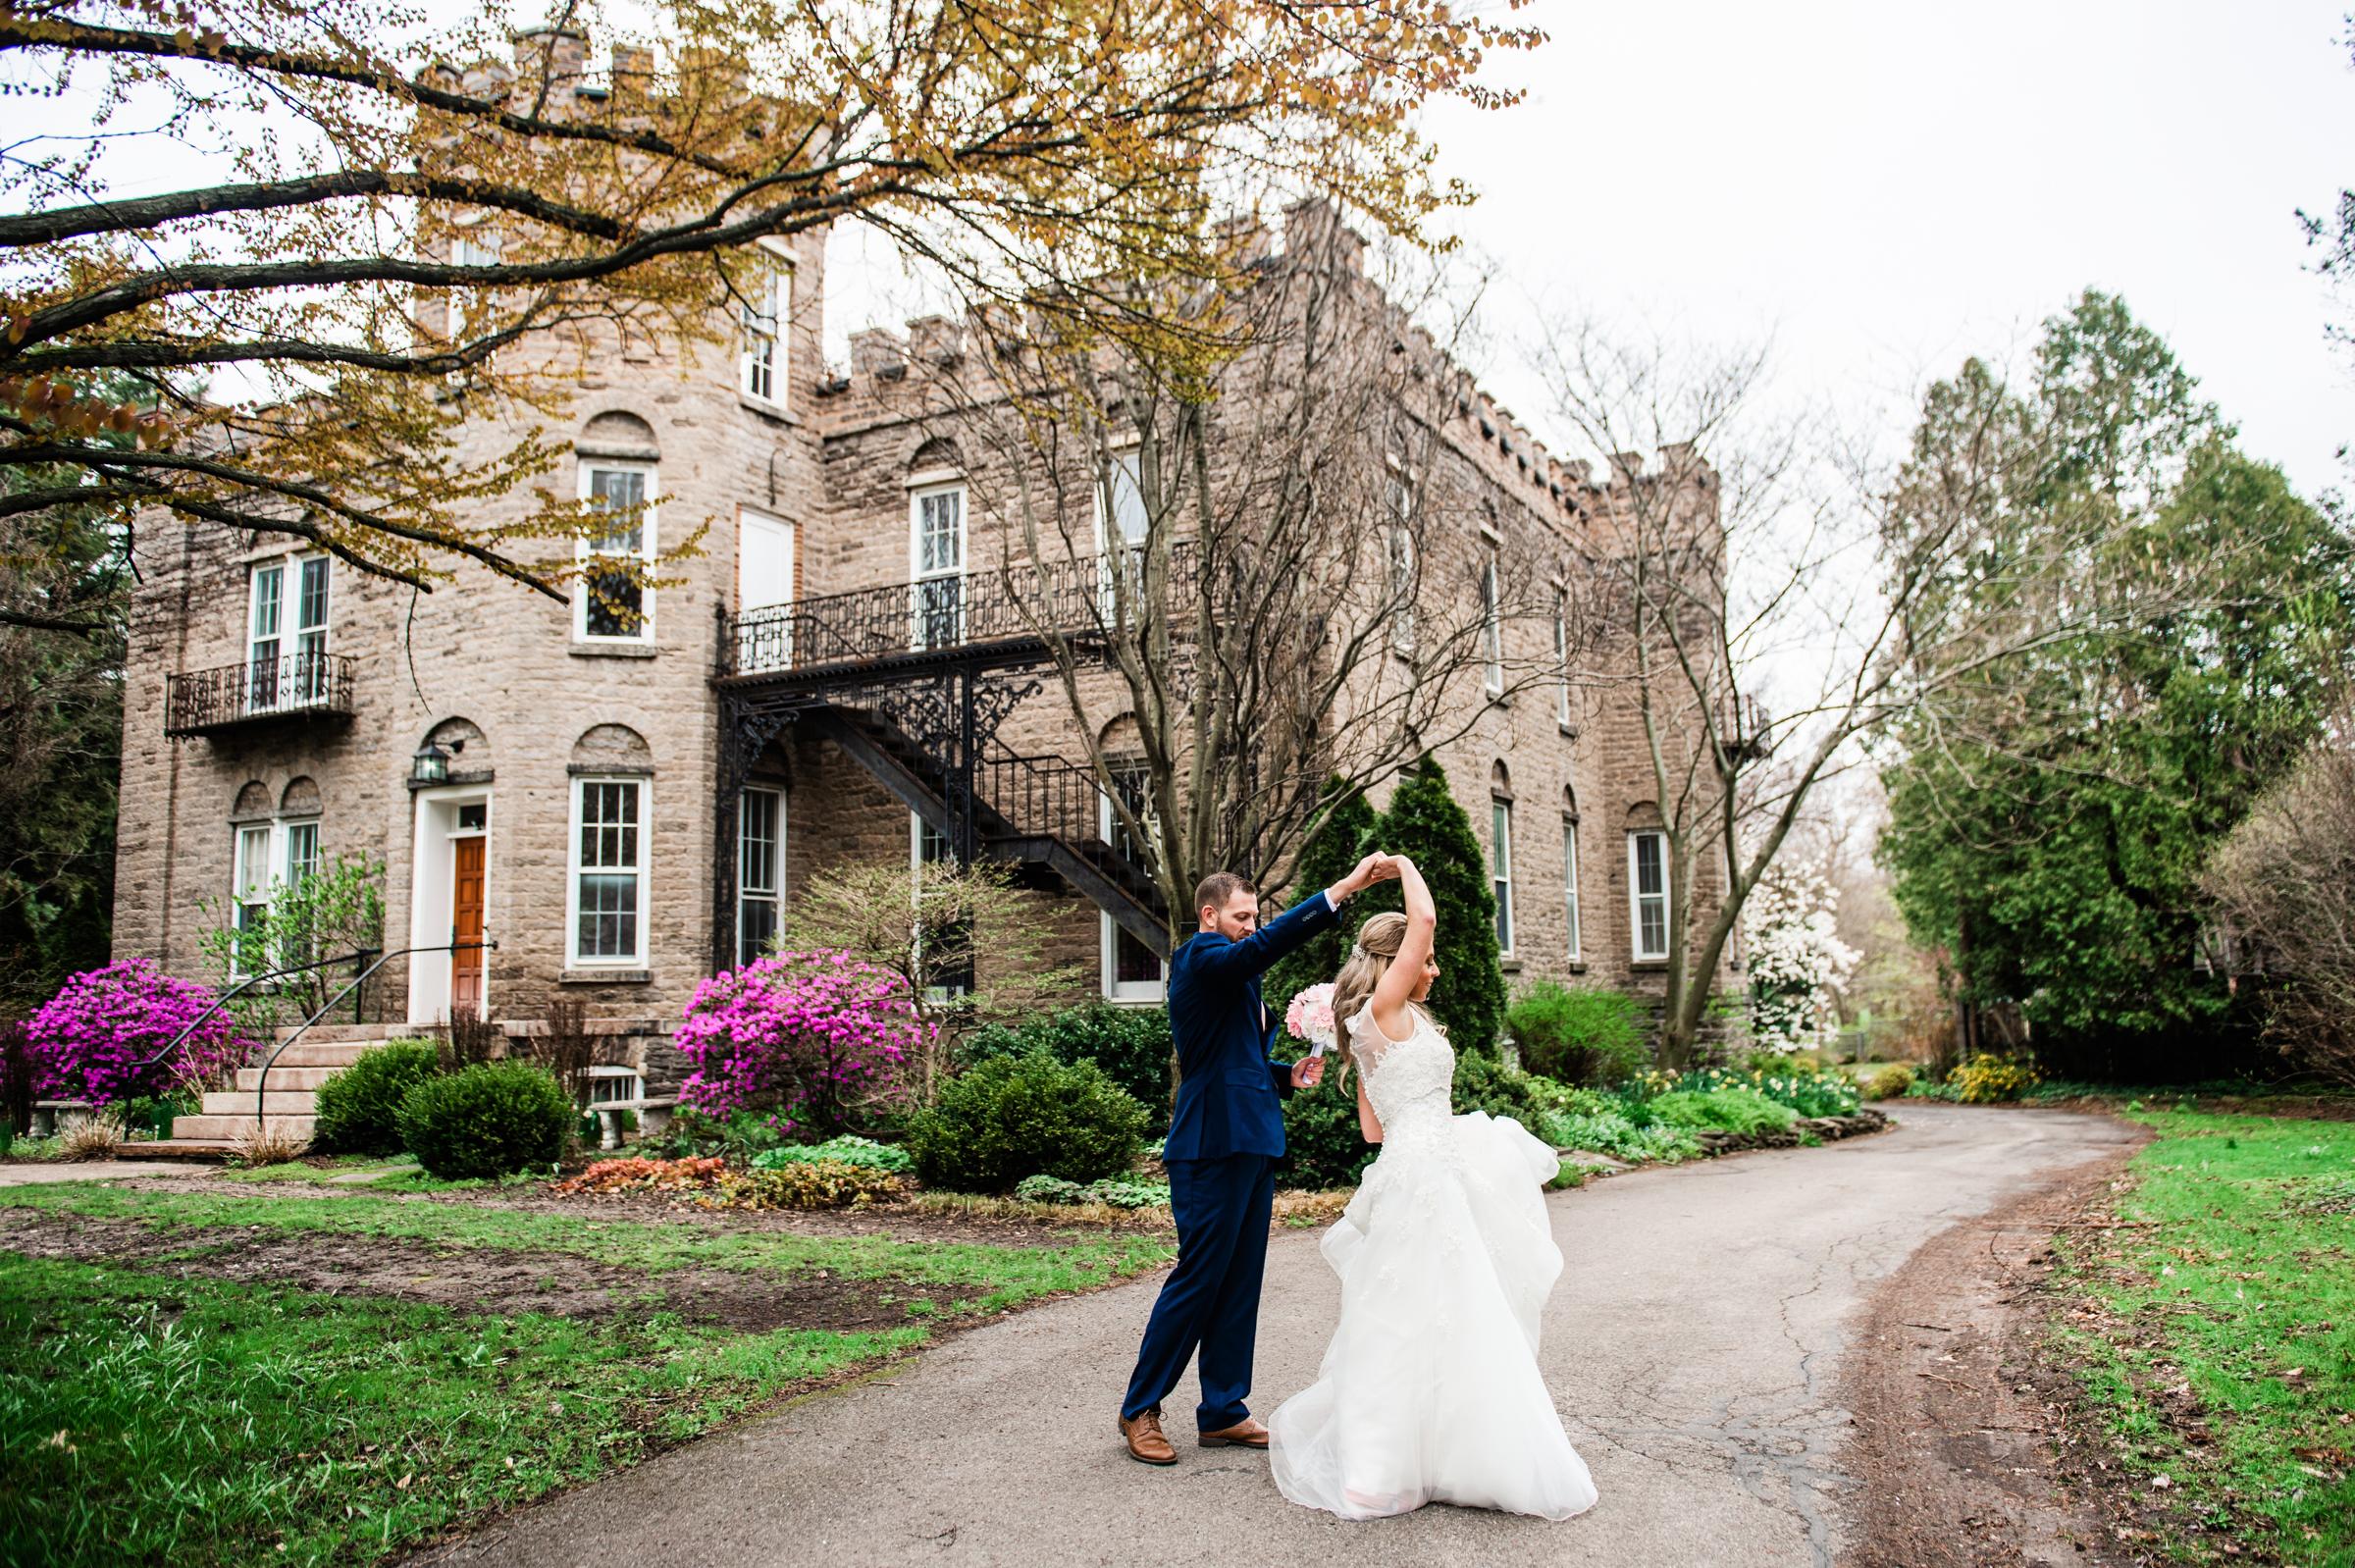 Double_Tree_by_Hilton_Rochester_Wedding_JILL_STUDIO_Rochester_NY_Photographer_DSC_3993.jpg